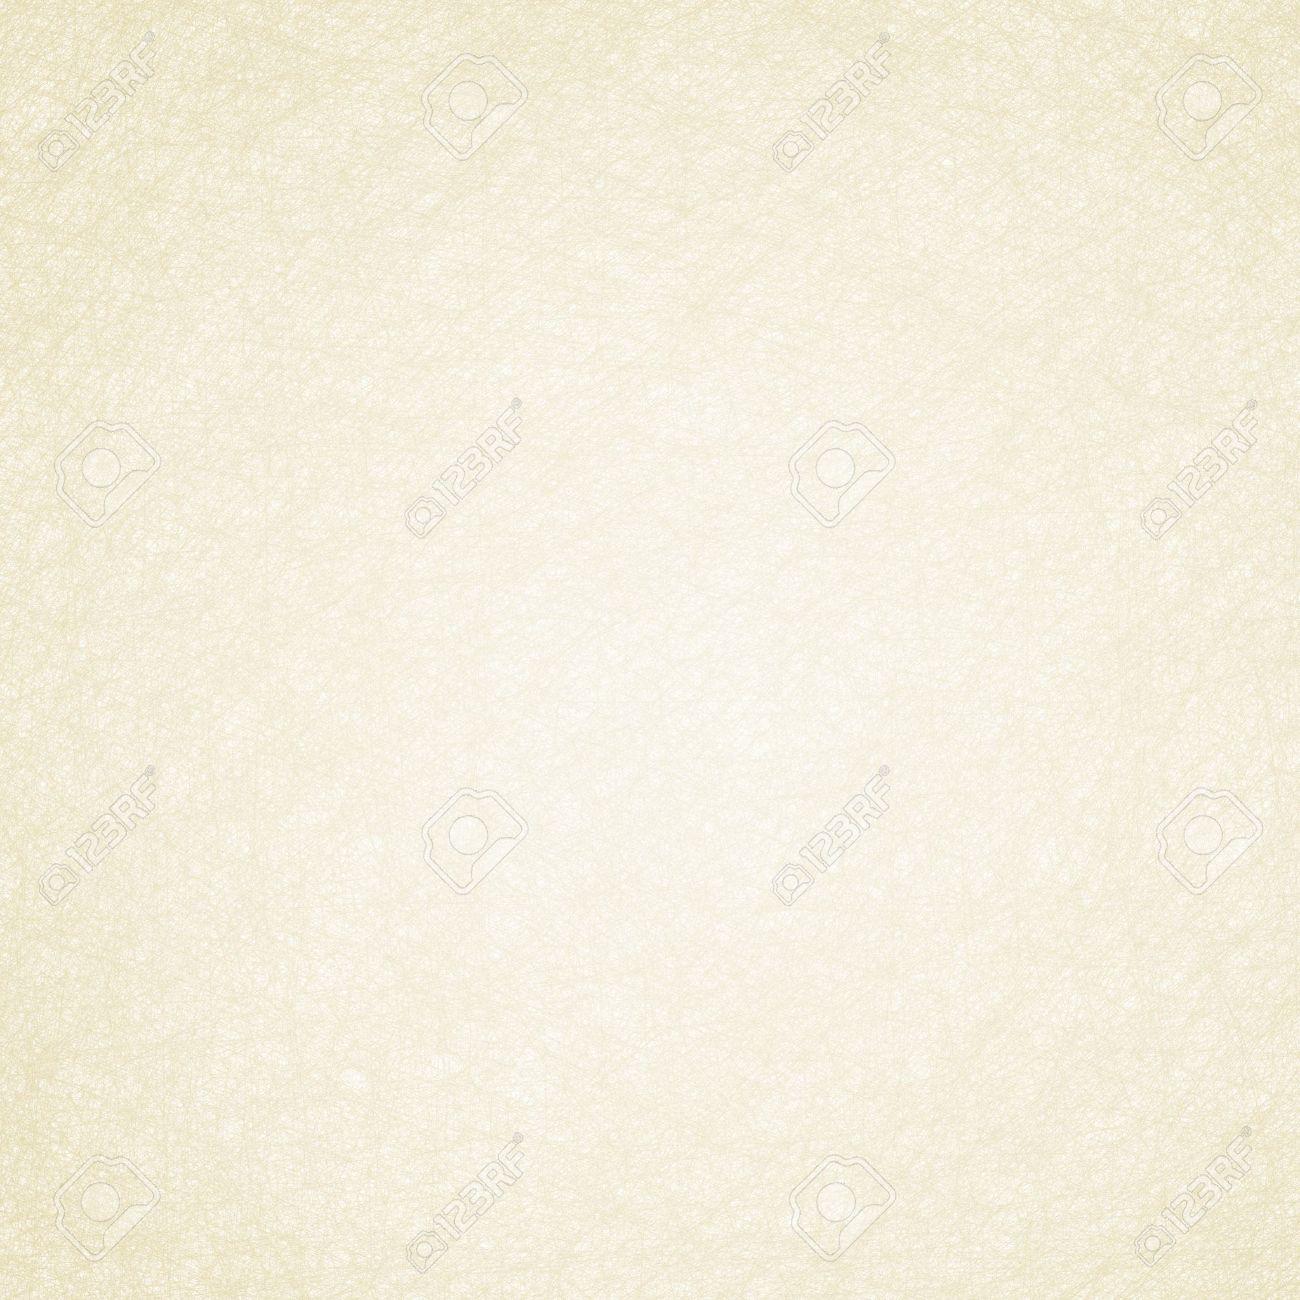 Abstracte Witte Achtergrond, Elegante Oude Bleke Vintage Grunge ...